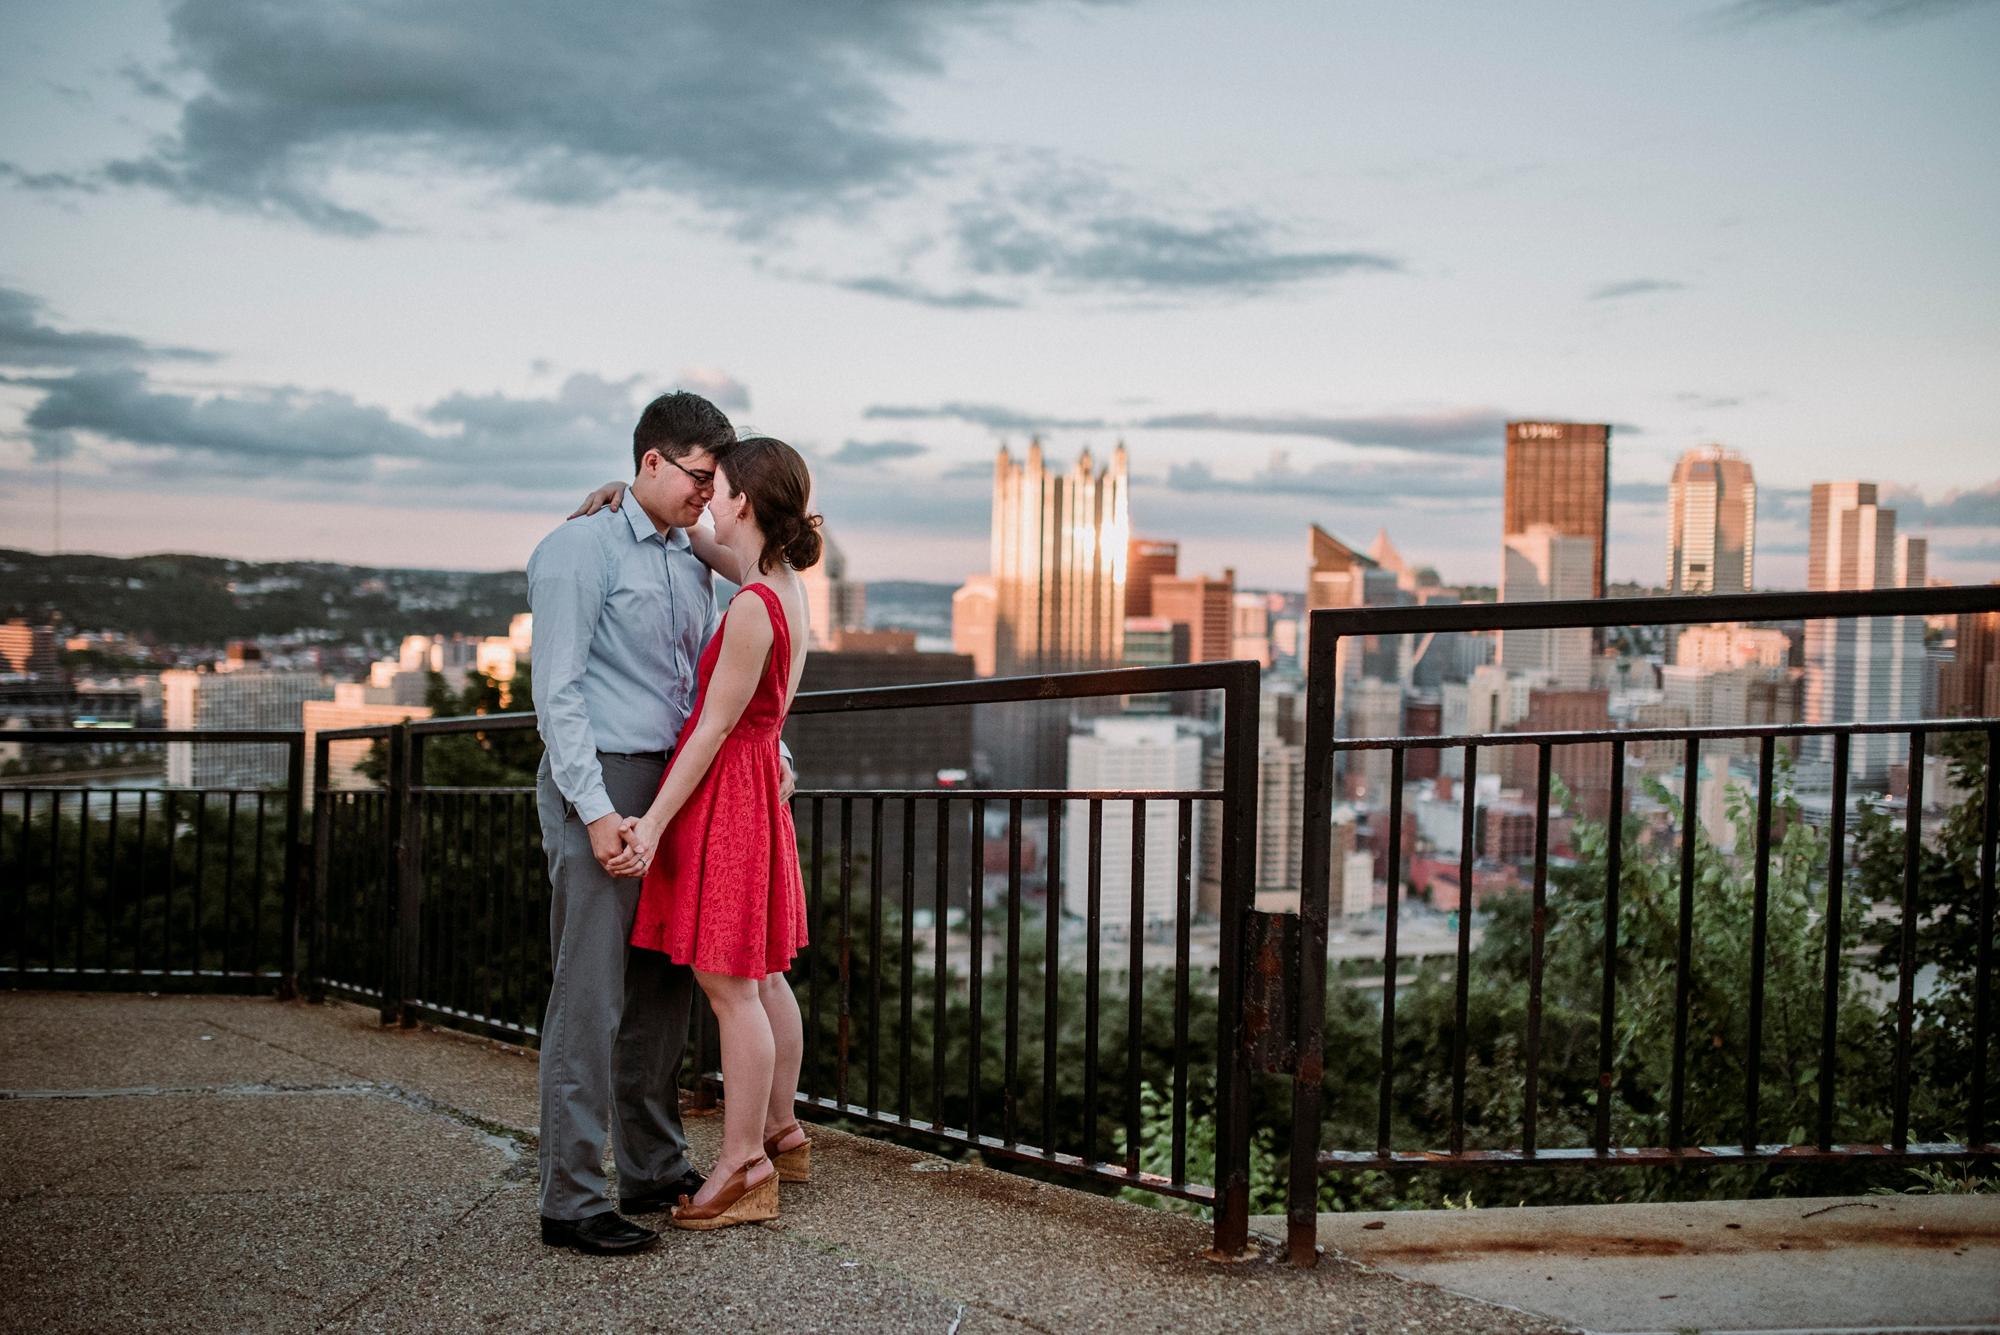 0260Jorge-Clara-Proposal-Pittsburgh_Proposal-Pittsburgh-Constructed-Adventures-Sandrachile.jpg